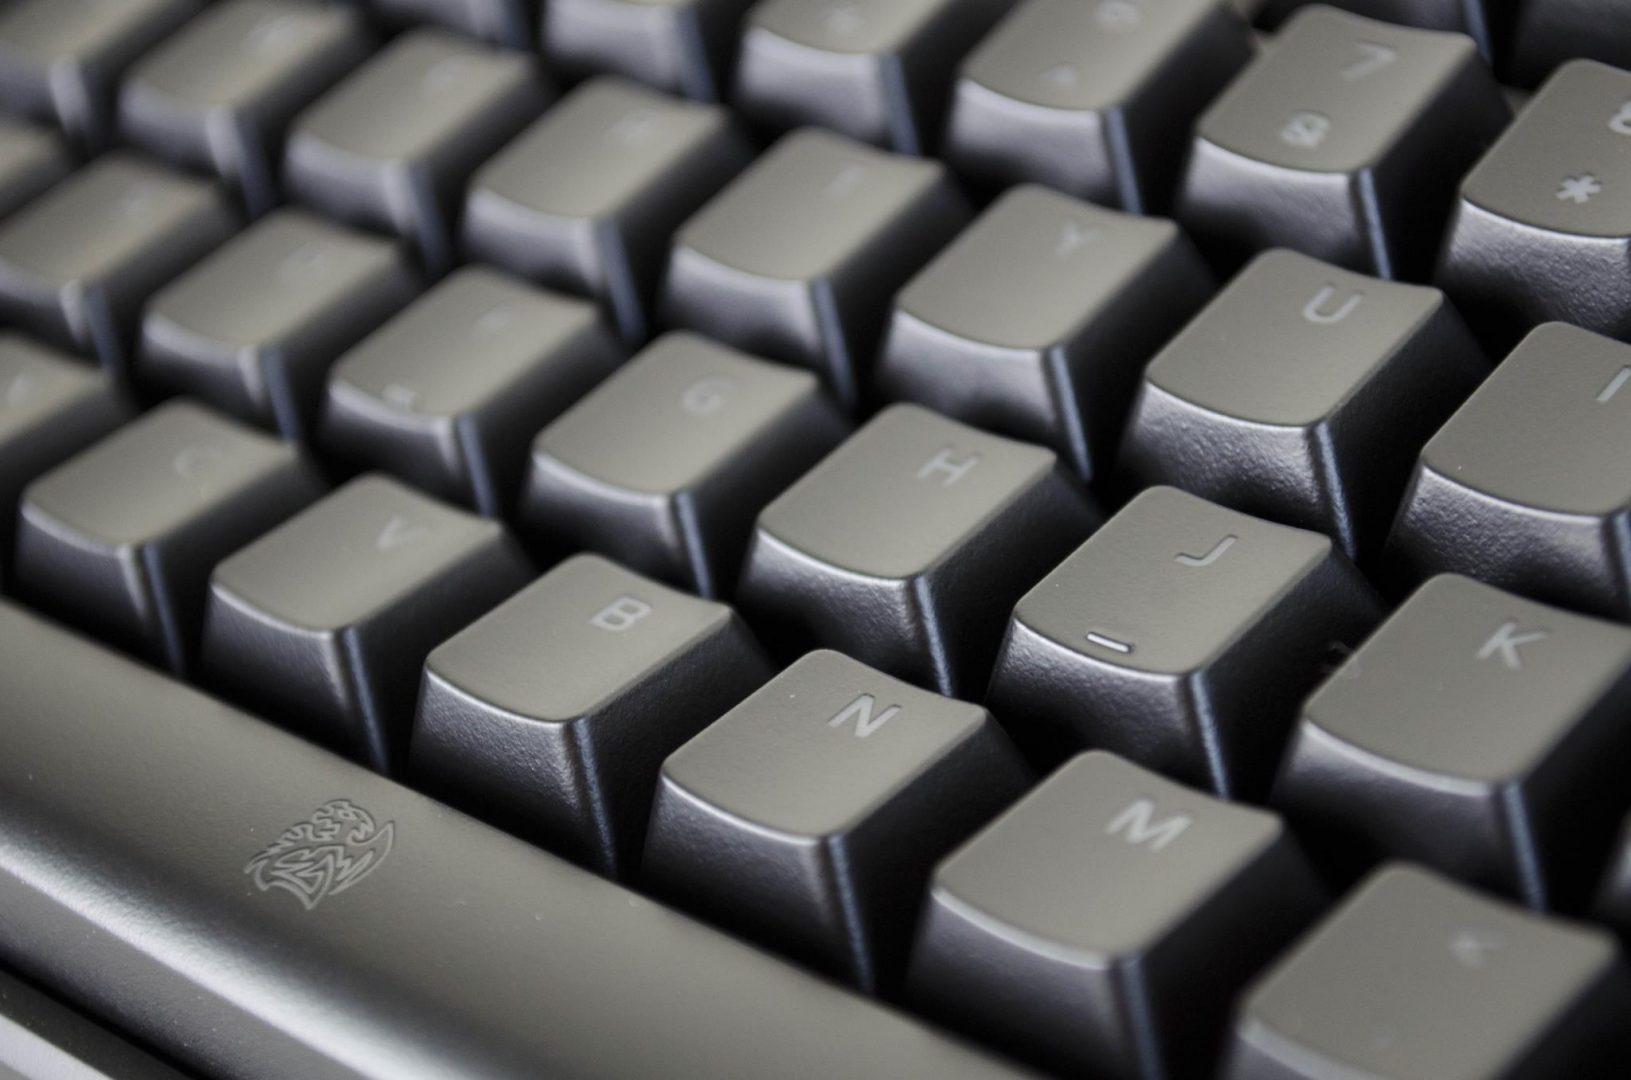 Tt eSPORTS POSEIDON Z Mechanical keyboard with brown switches_7